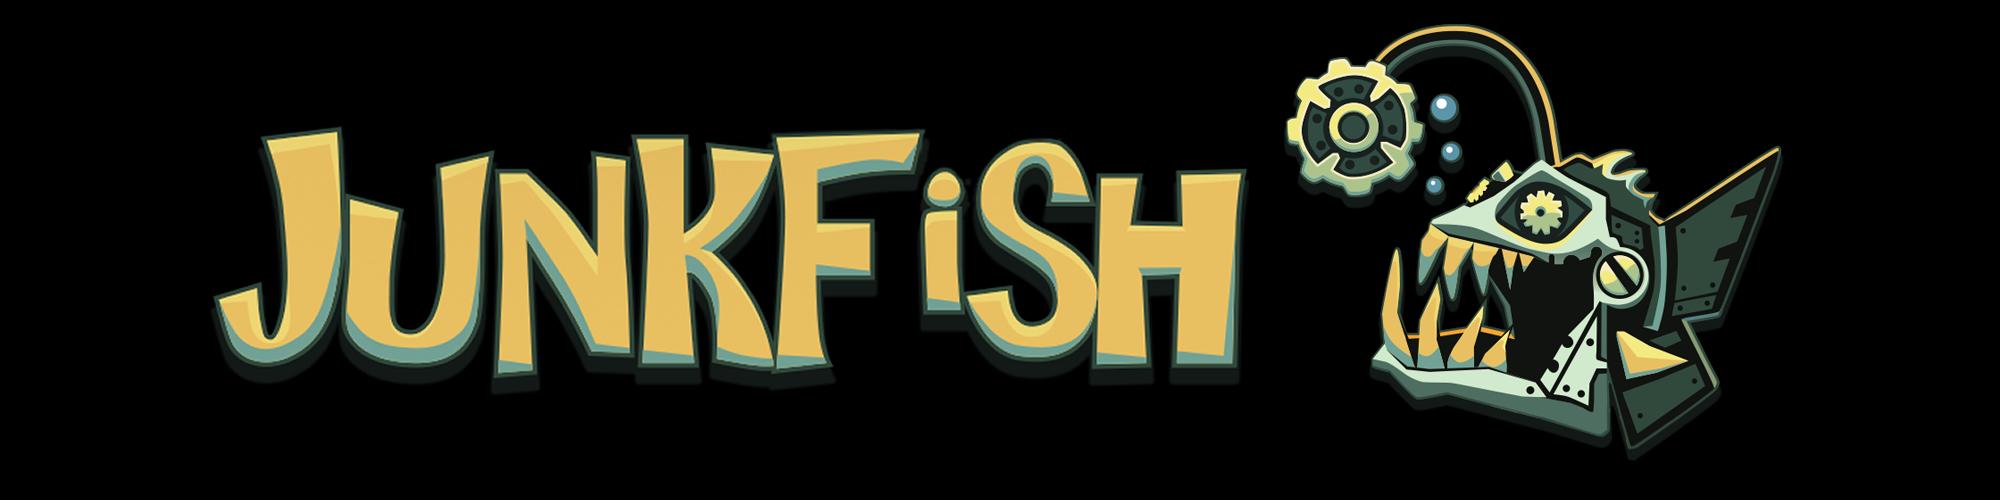 junkfish banner